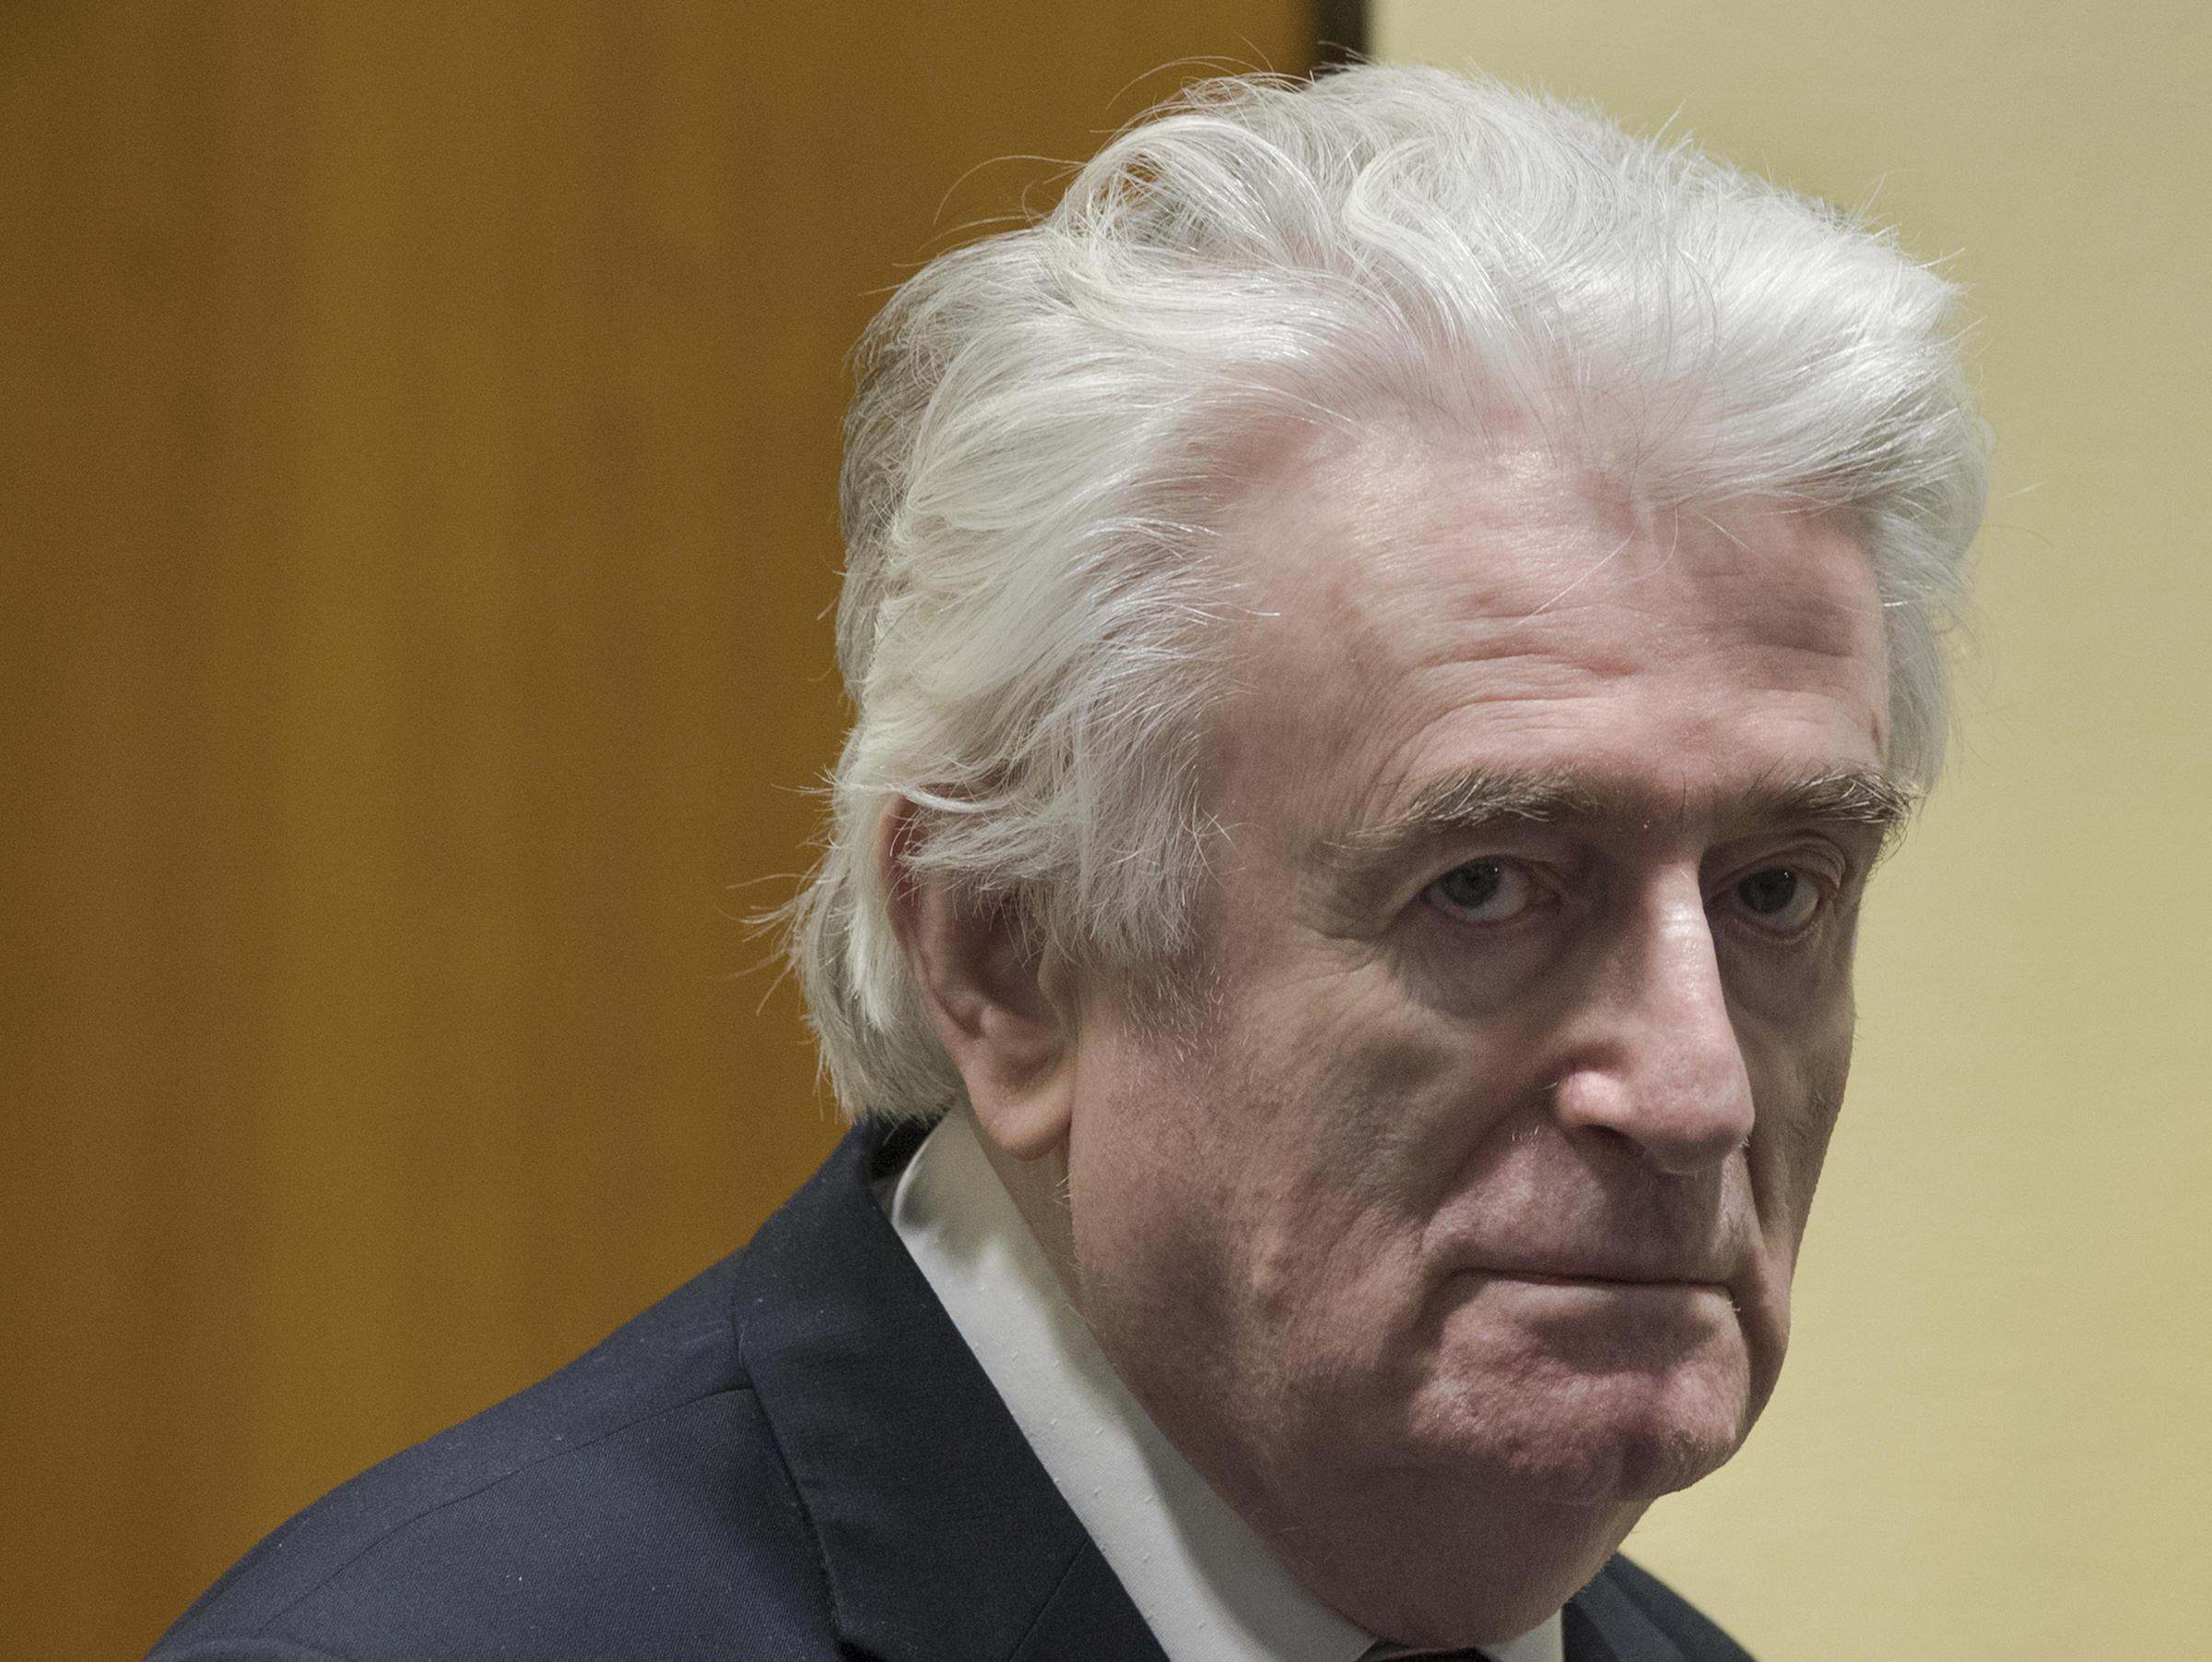 Radovan Karadžić Gets Life As Hague Court Upholds Genocide Conviction